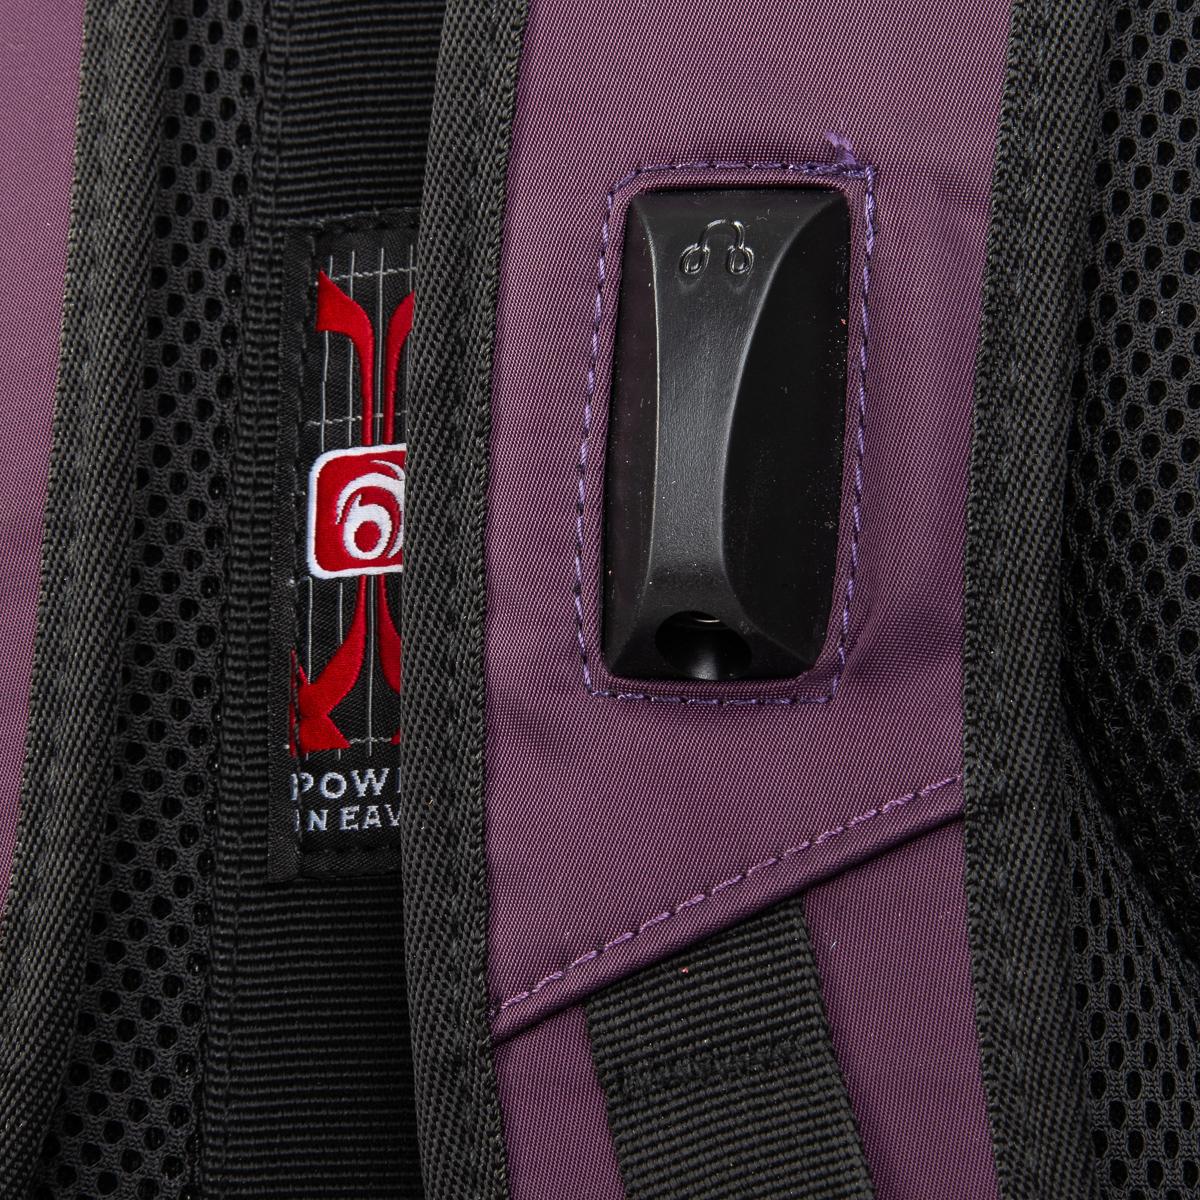 Рюкзак Городской нейлон Power In Eavas 5143 purple - фото 4